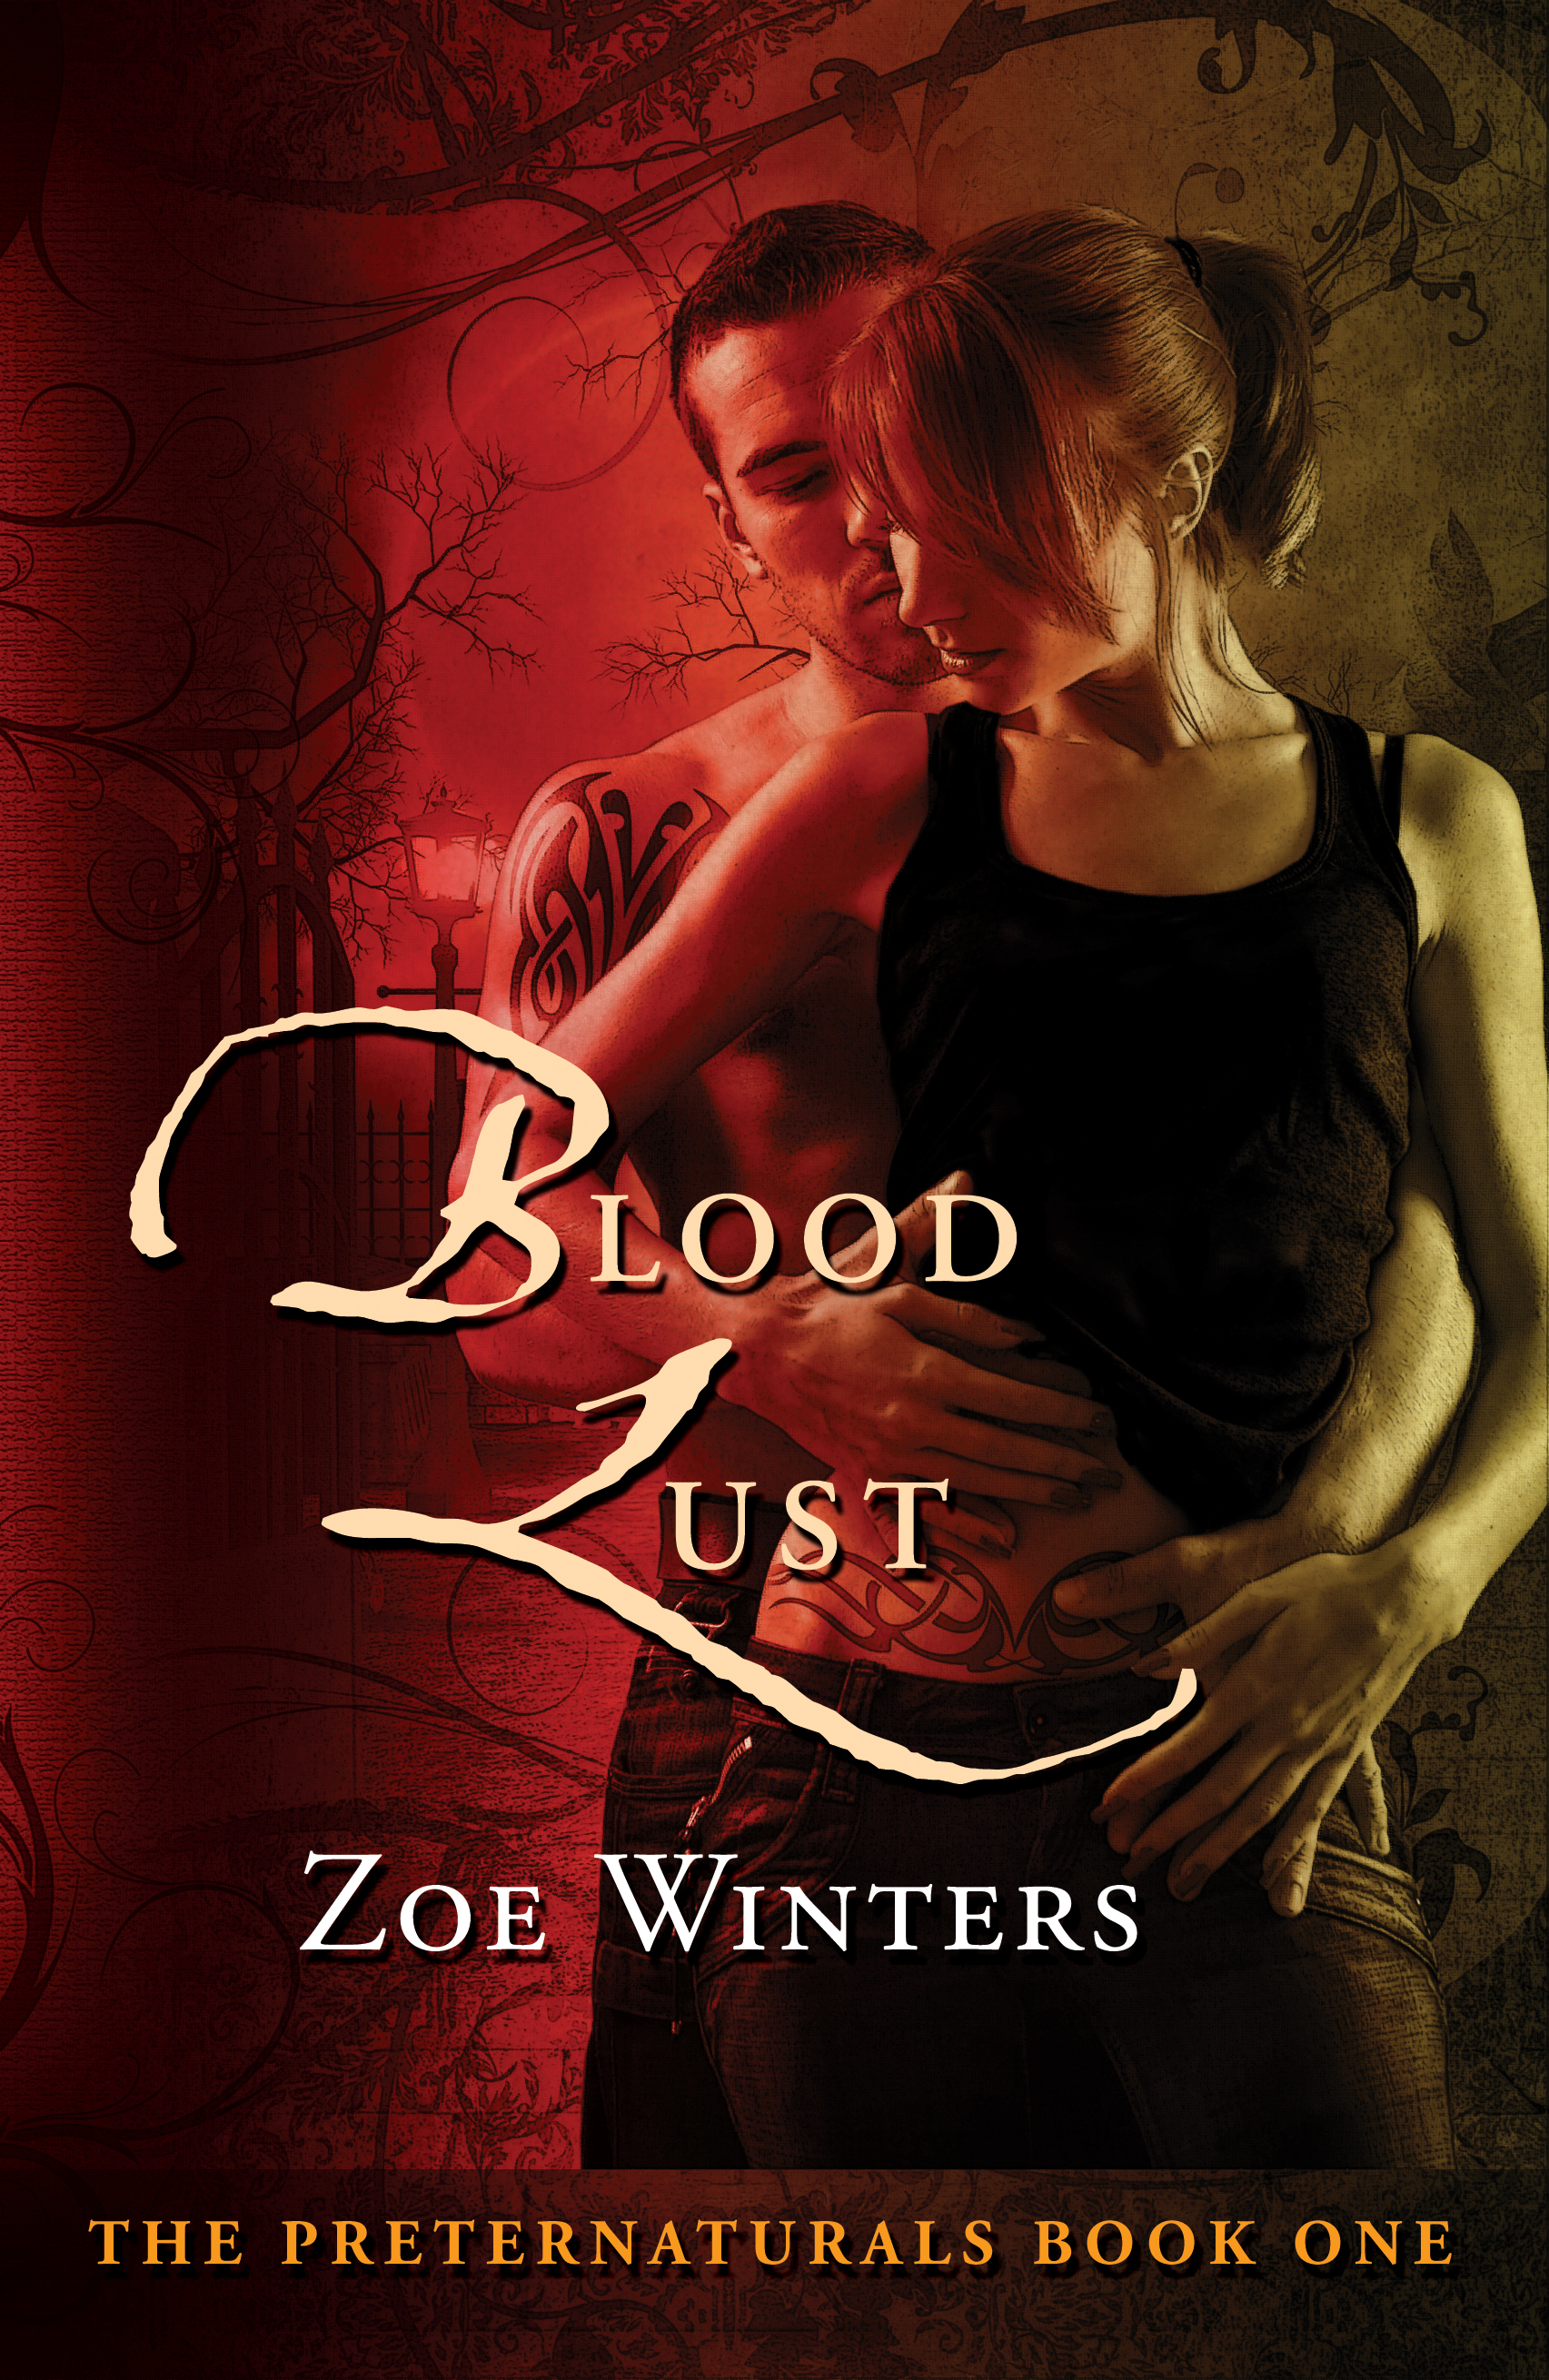 Zoe Winters - Blood Lust (Paranormal Romance/Urban Fantasy: Preternaturals Book 1)